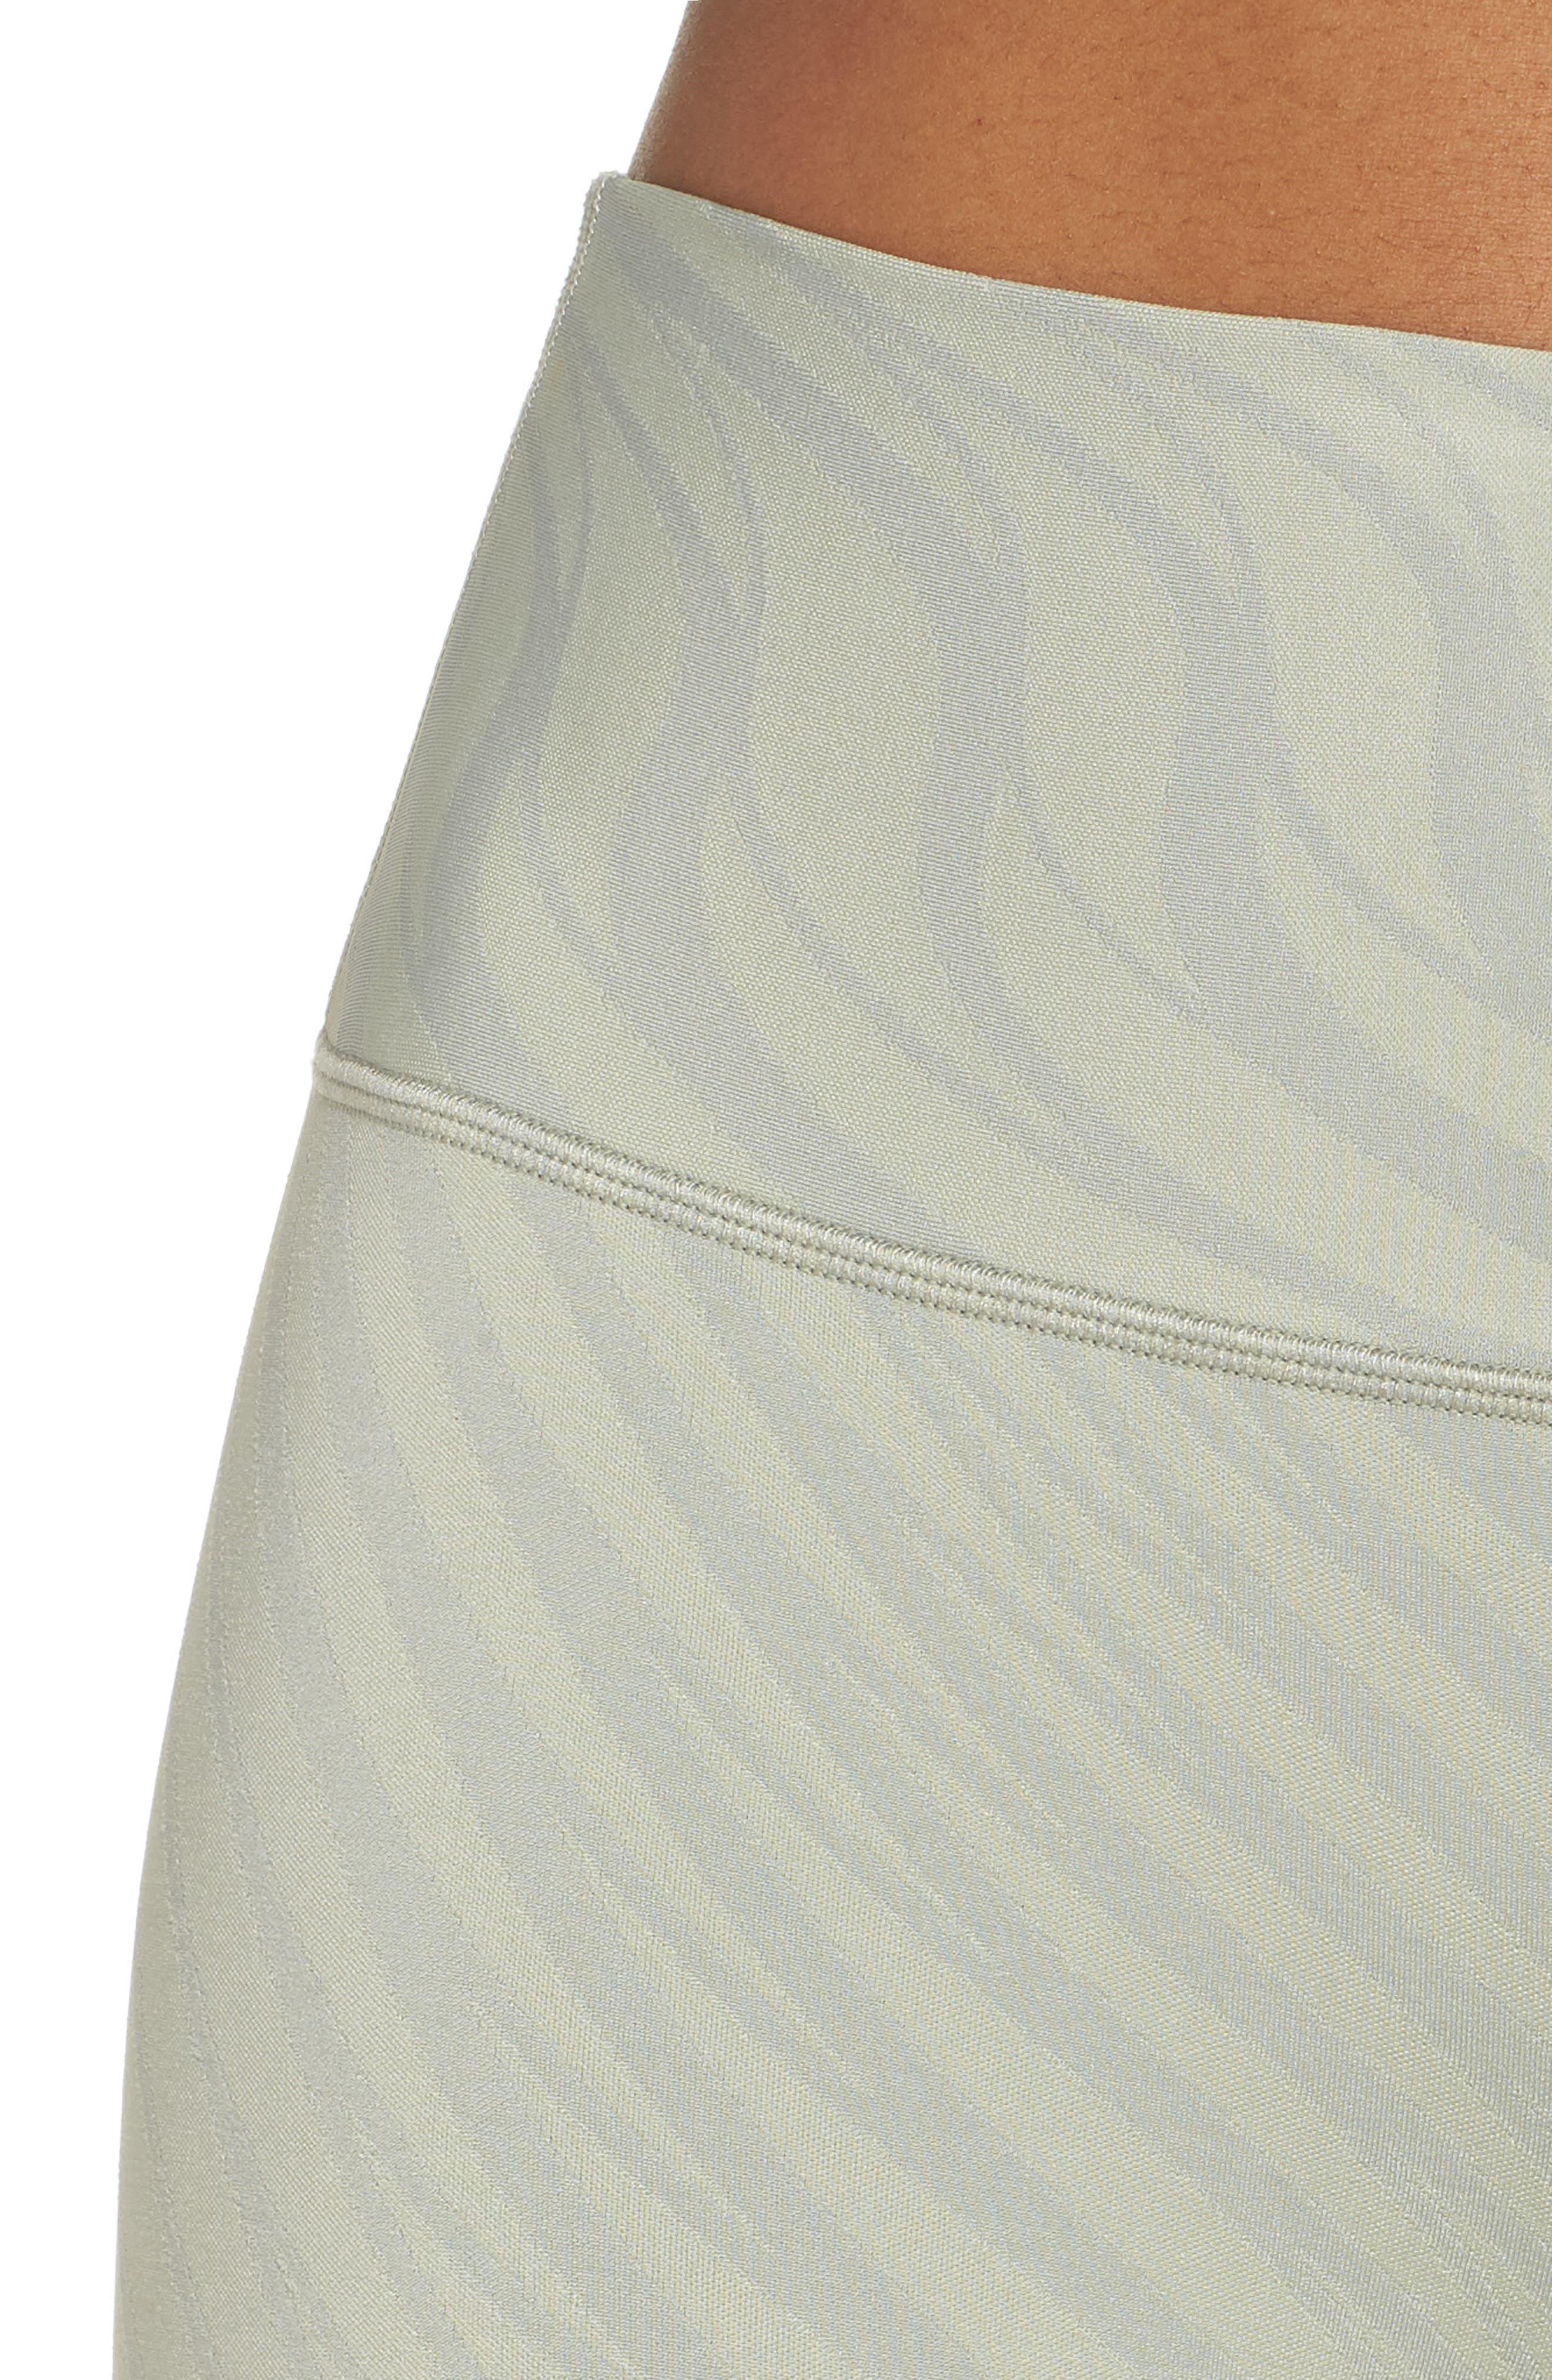 Airbrush High Waist Capris,                             Alternate thumbnail 4, color,                             Pistachio Waves